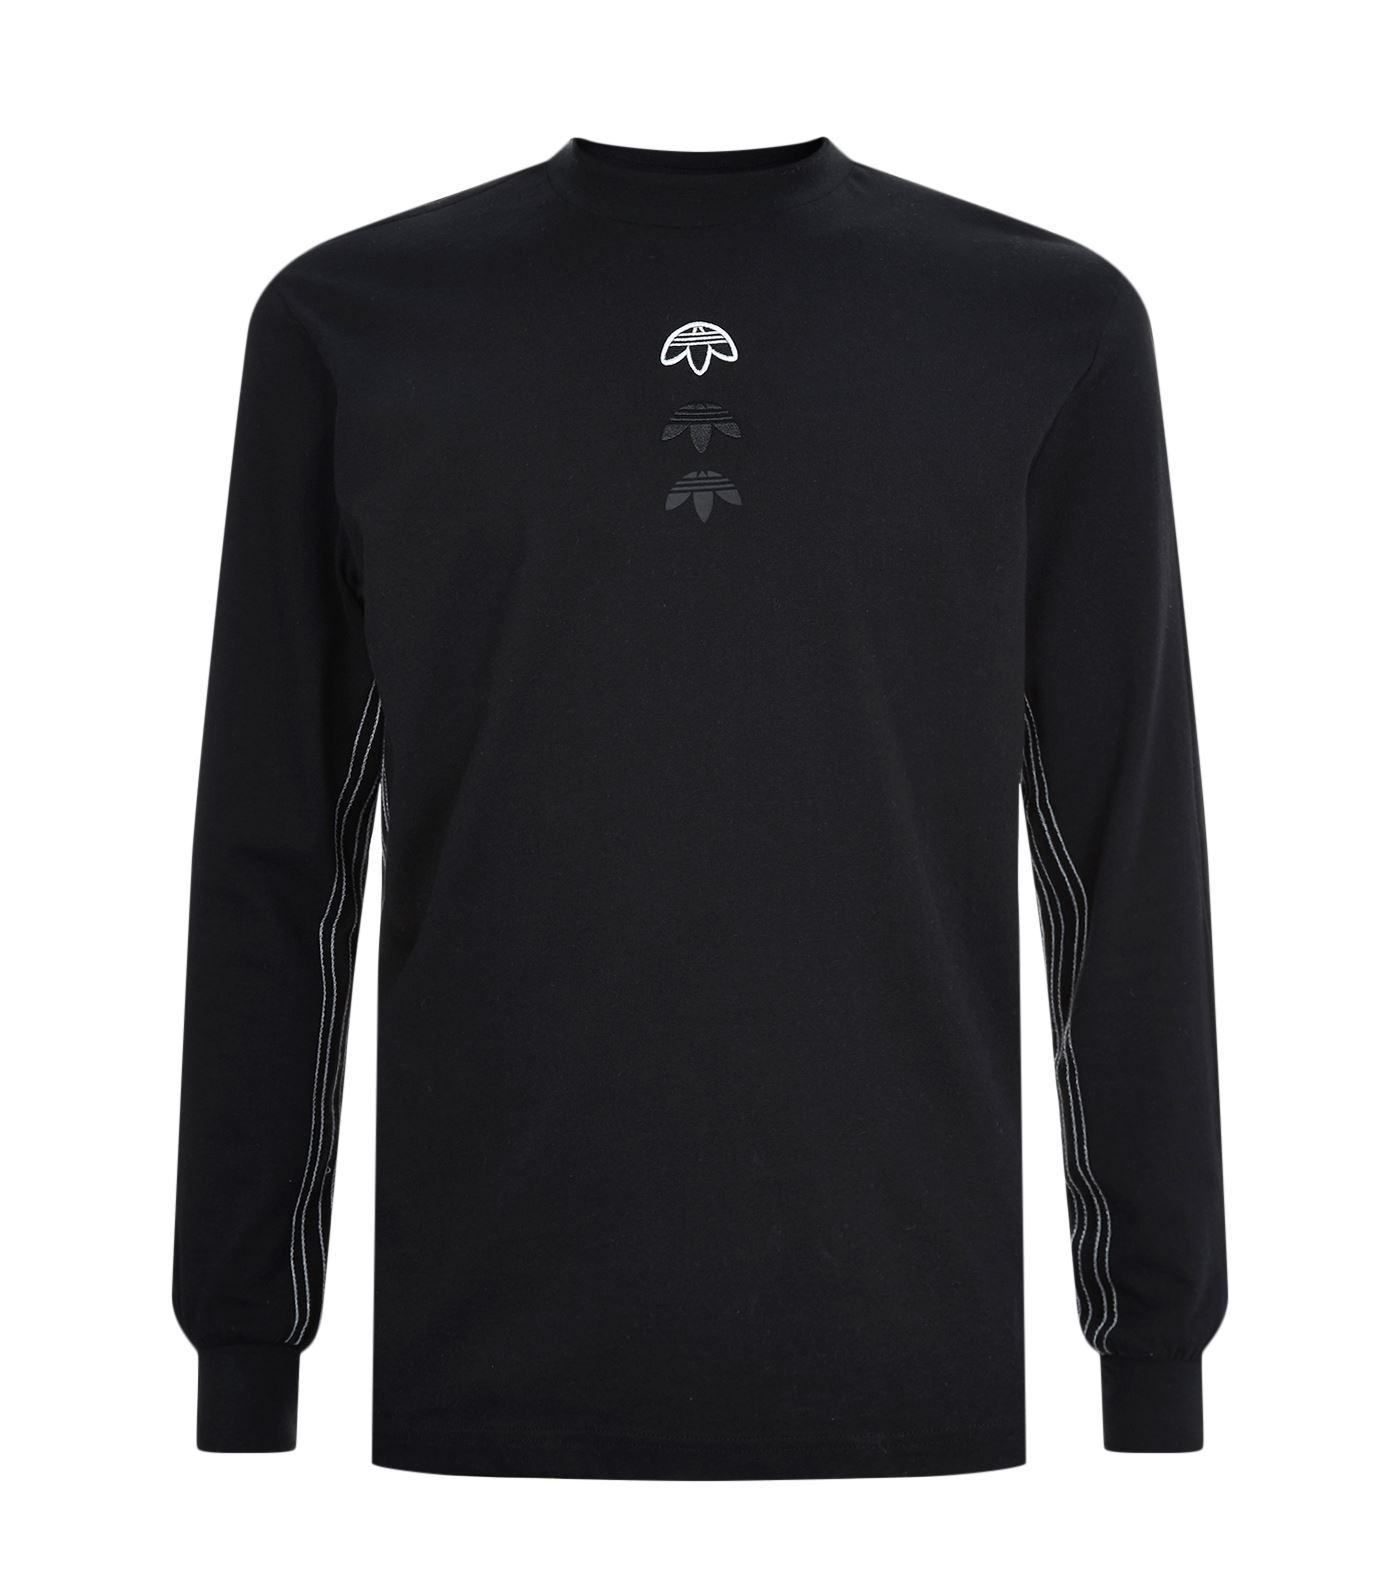 Lyst Adidas Originals Long Sleeve Upside Down Trefoil T